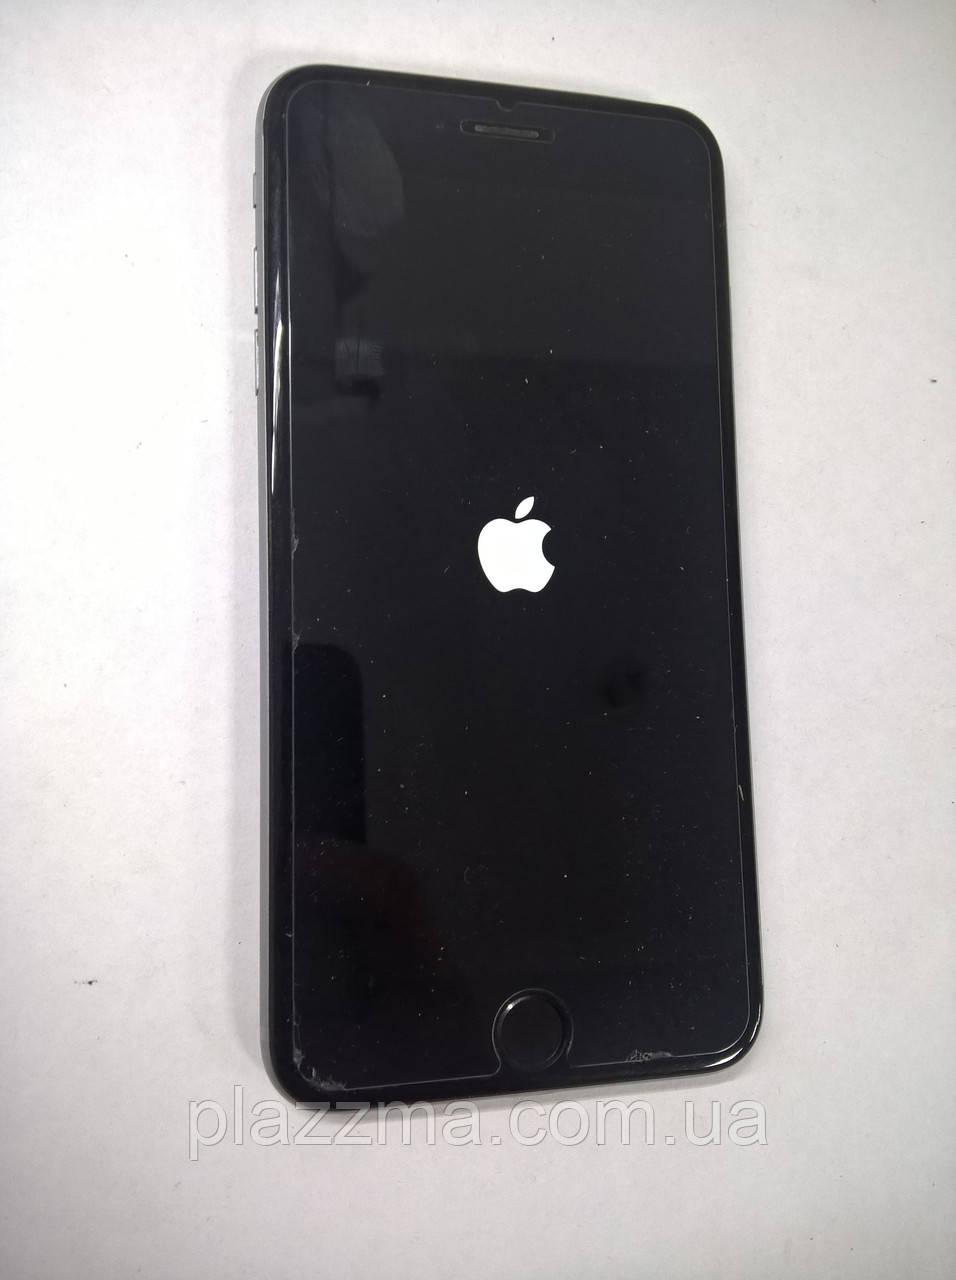 Iphone 6s Plus iСloud Lock Разборка